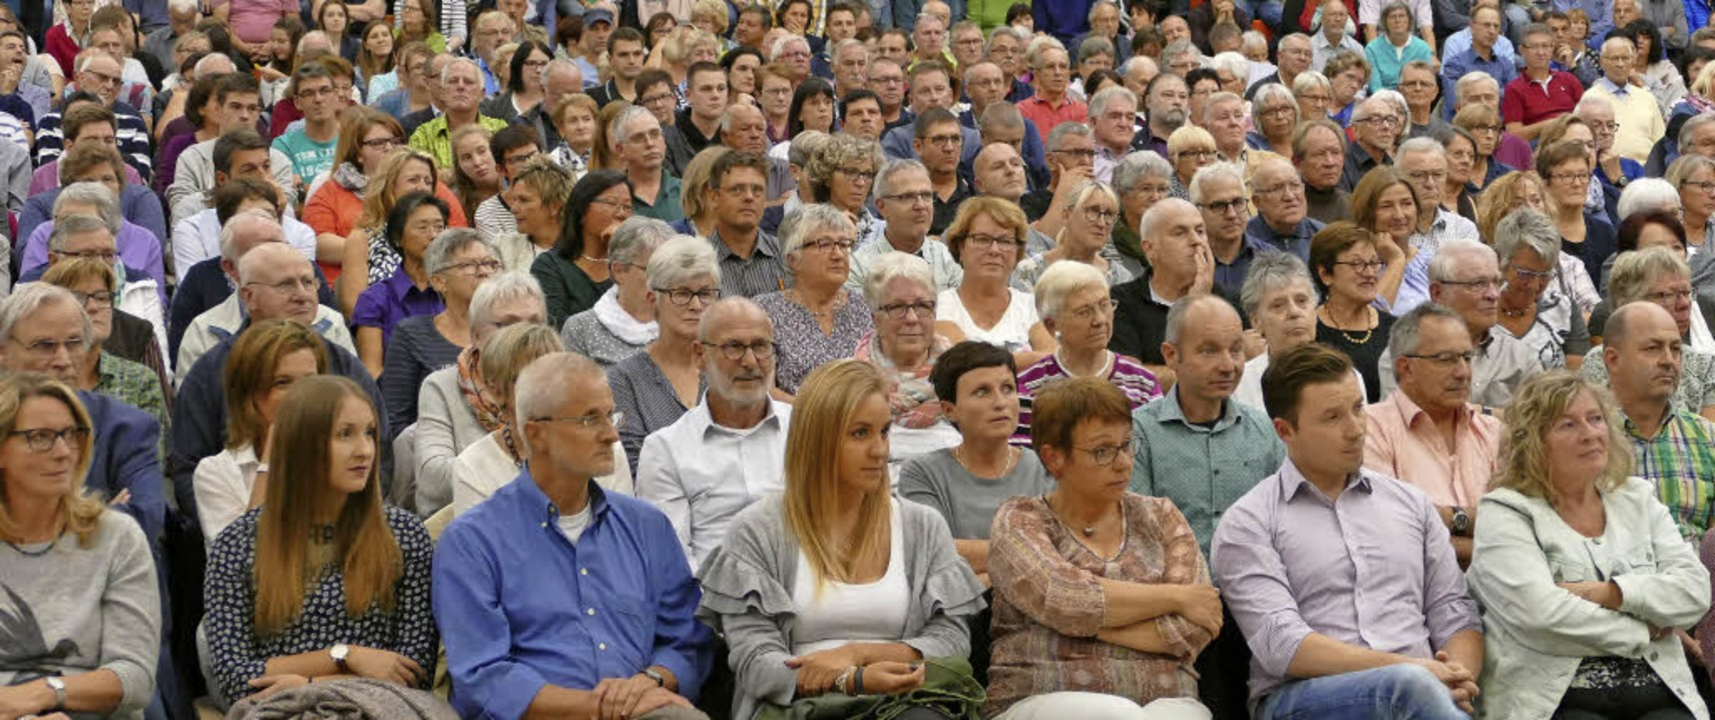 Viele Bürger nutzten die Gelegenheit, ...ürgermeisterkandidaten zu informieren.    Foto: Lena Marie Jörger